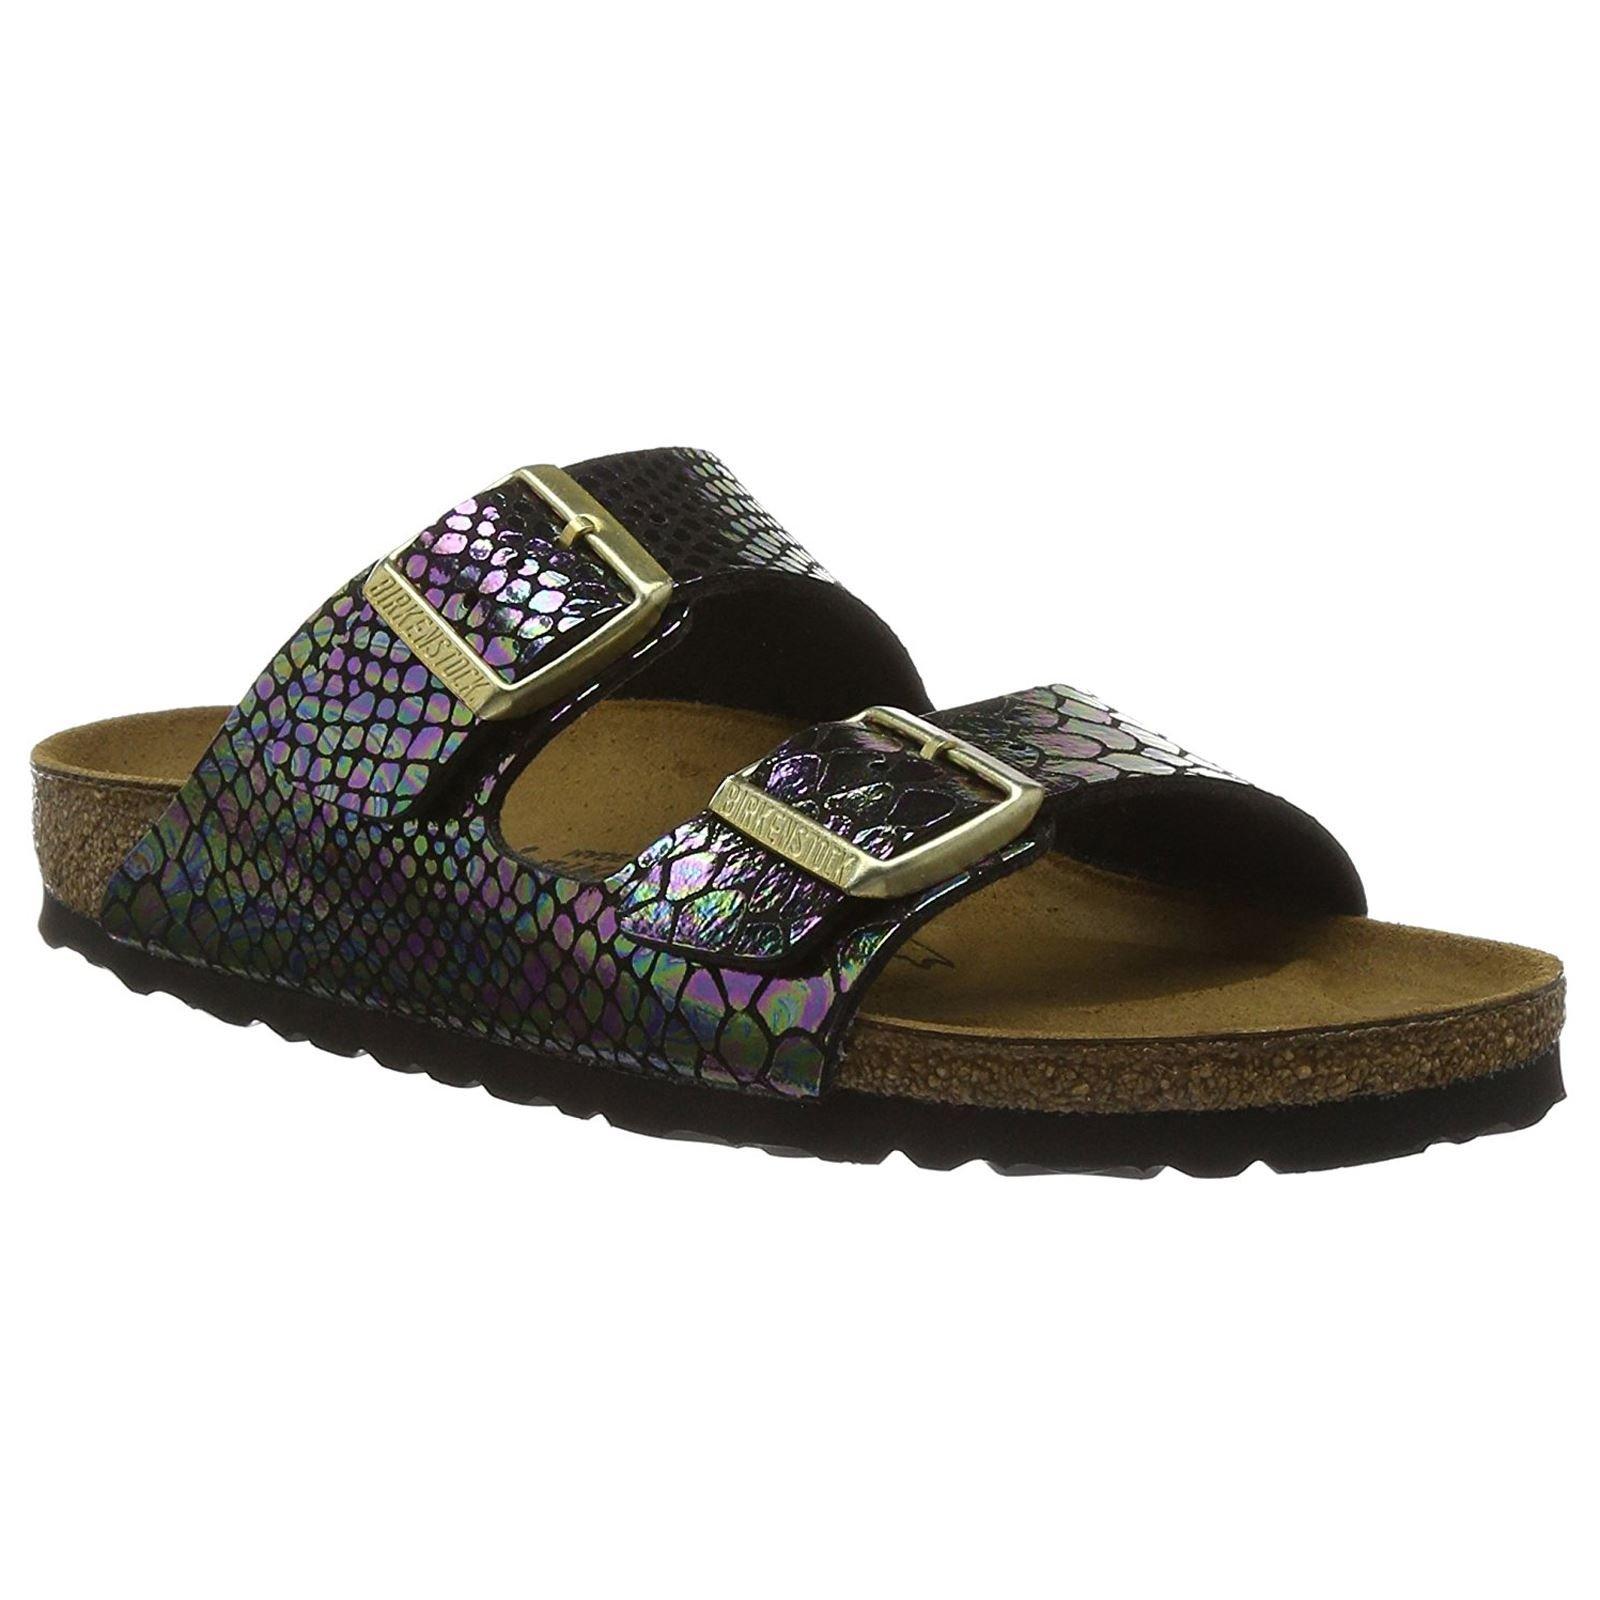 Birkenstock Unisex Arizona Shiny Snake Black Multi Birko-flor Sandals - 7-7.5 B(M) US Women